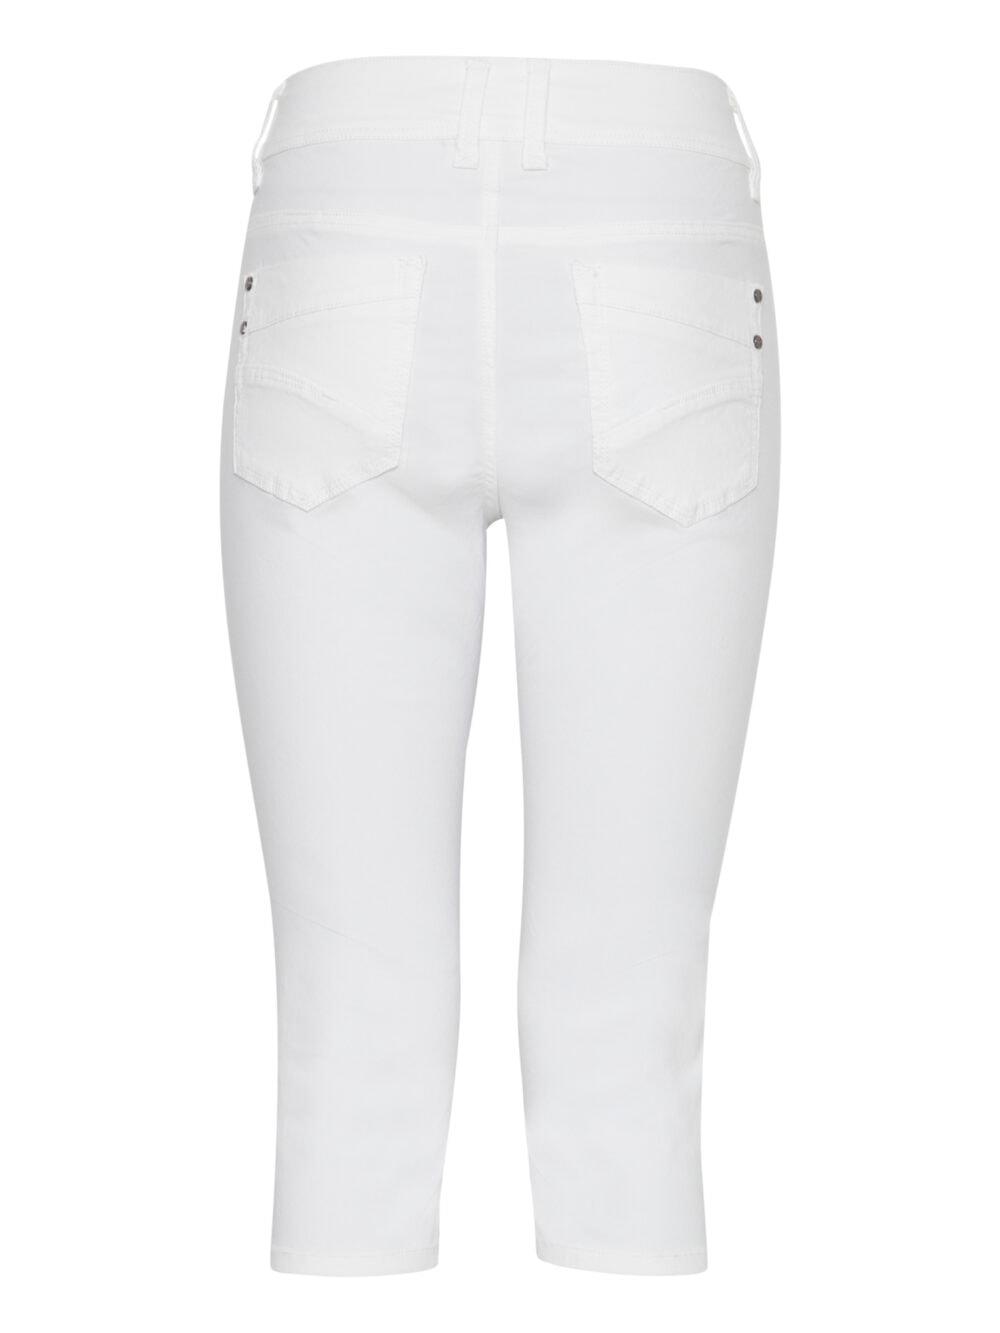 Fransa Zalin 8 Knickers White